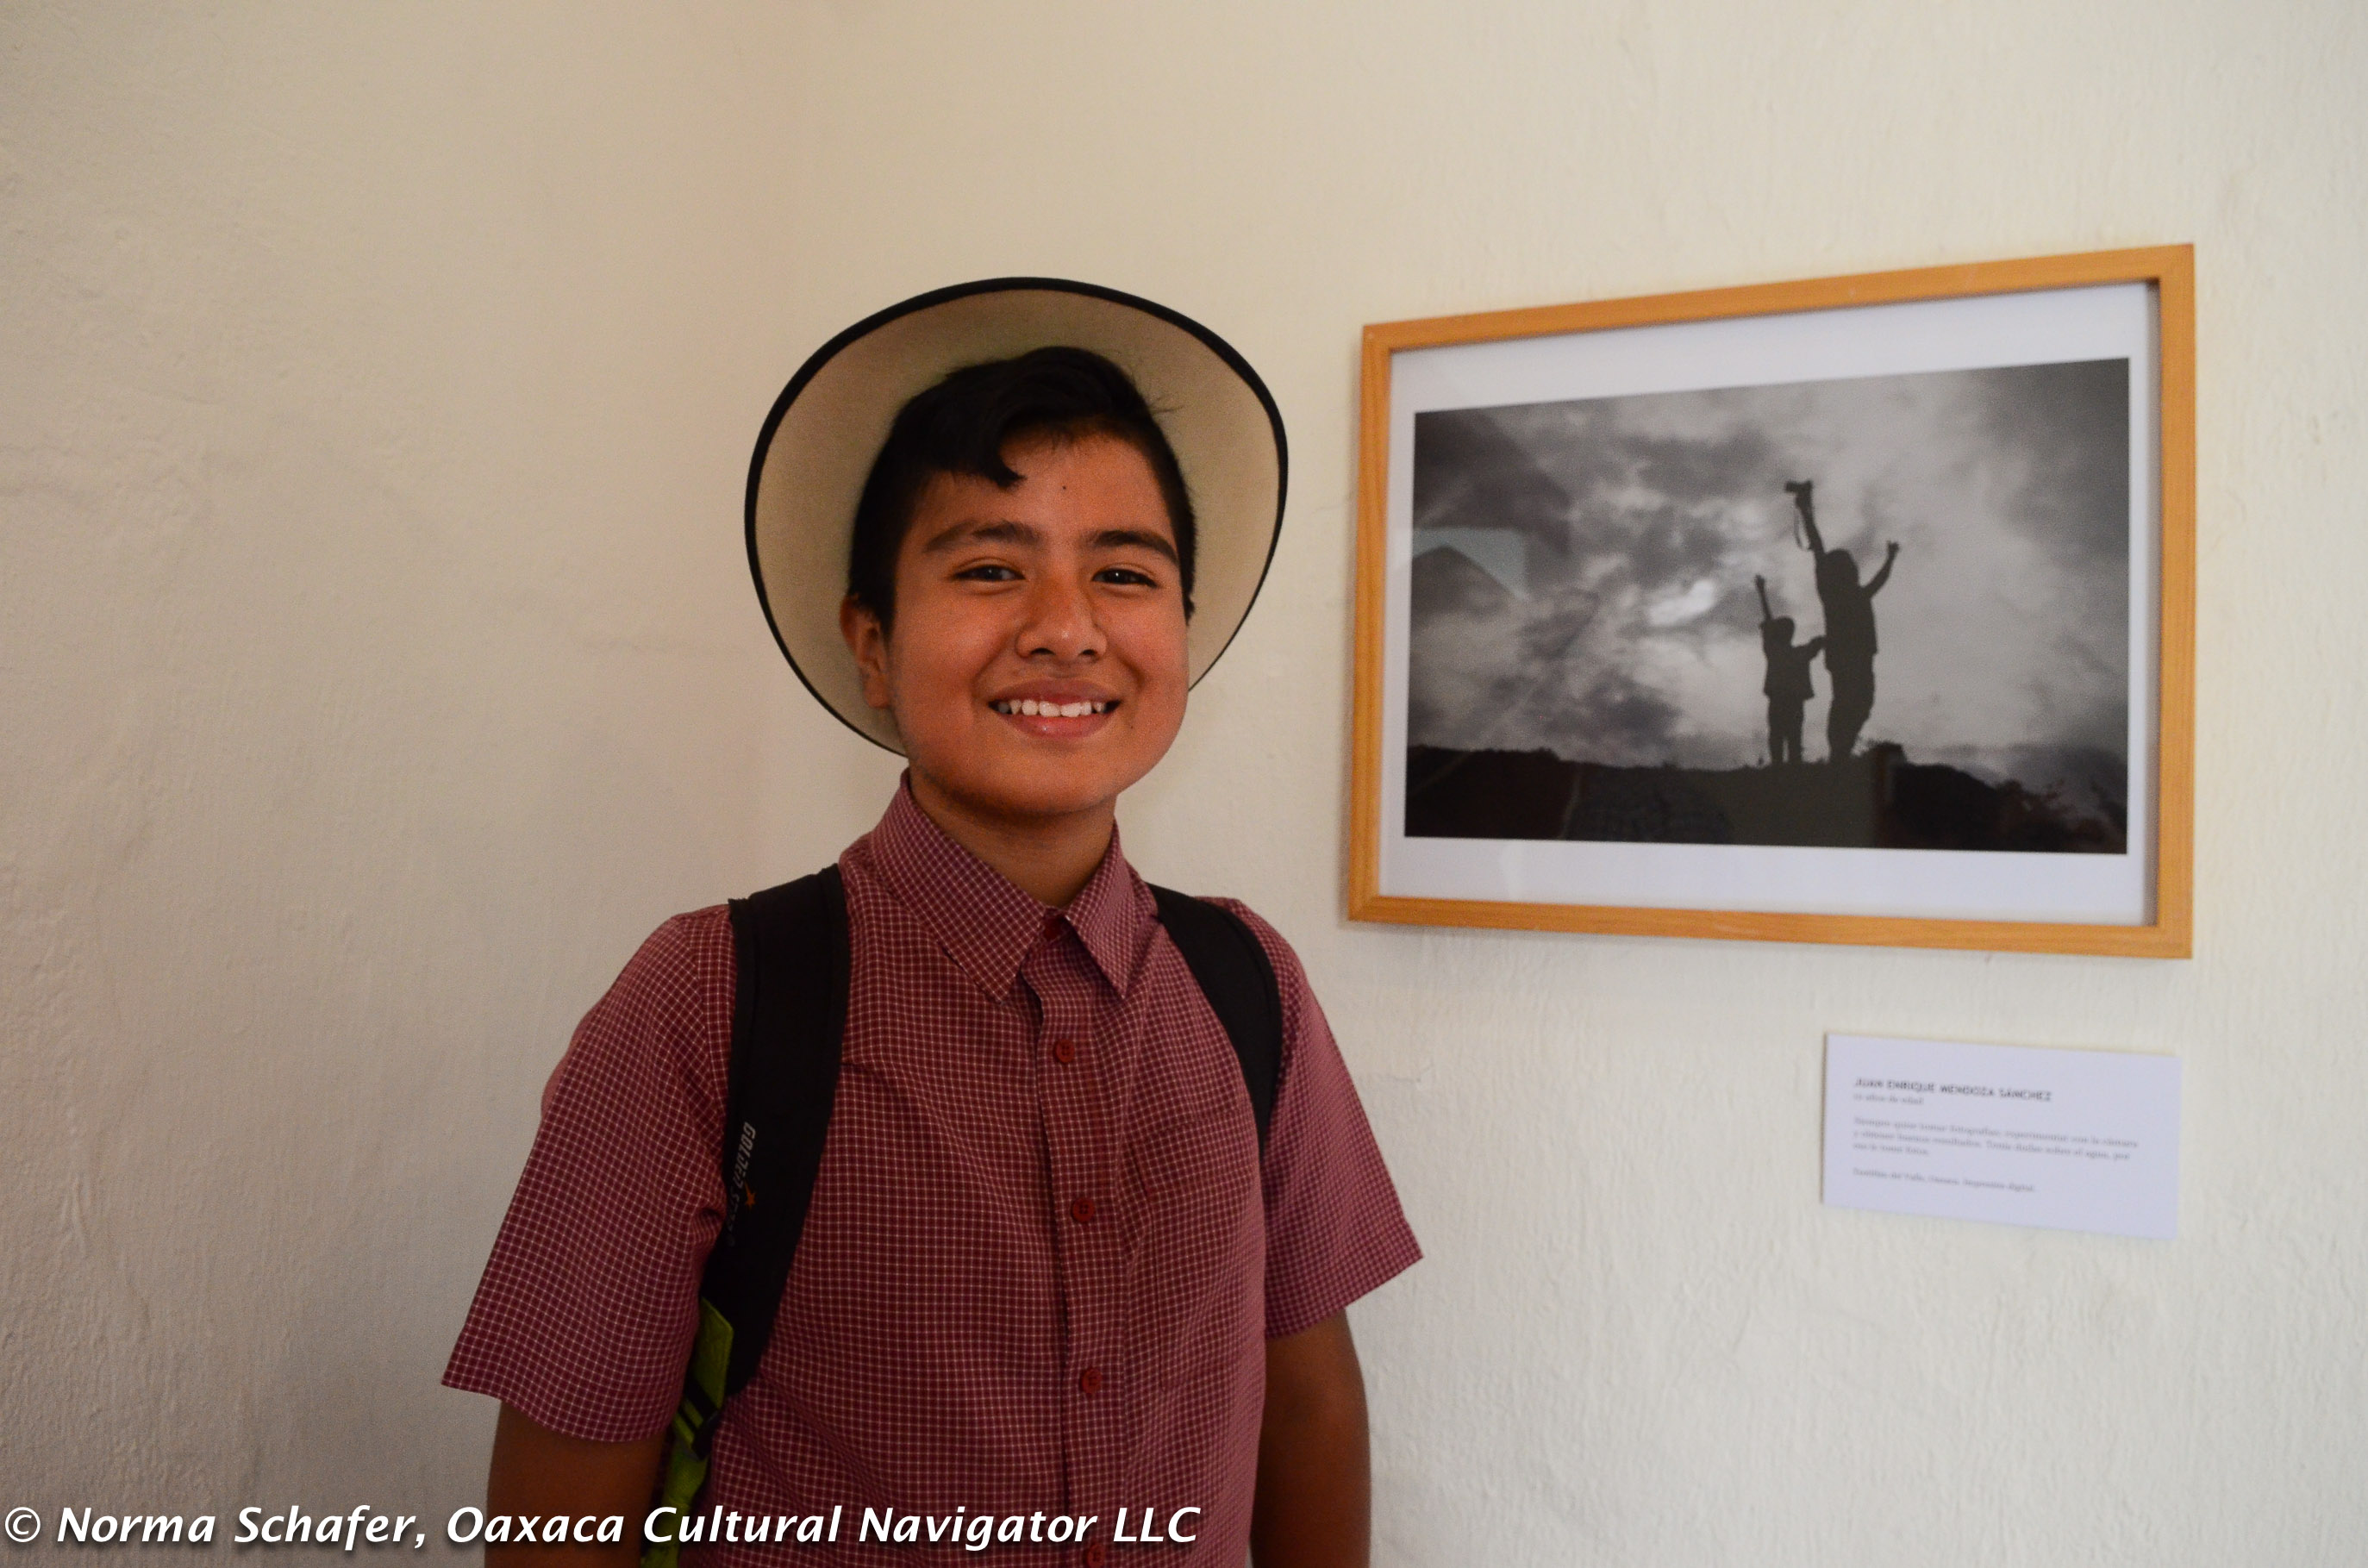 Centro fotografico alvarez bravo oaxaca cultural - Juan enrique ...